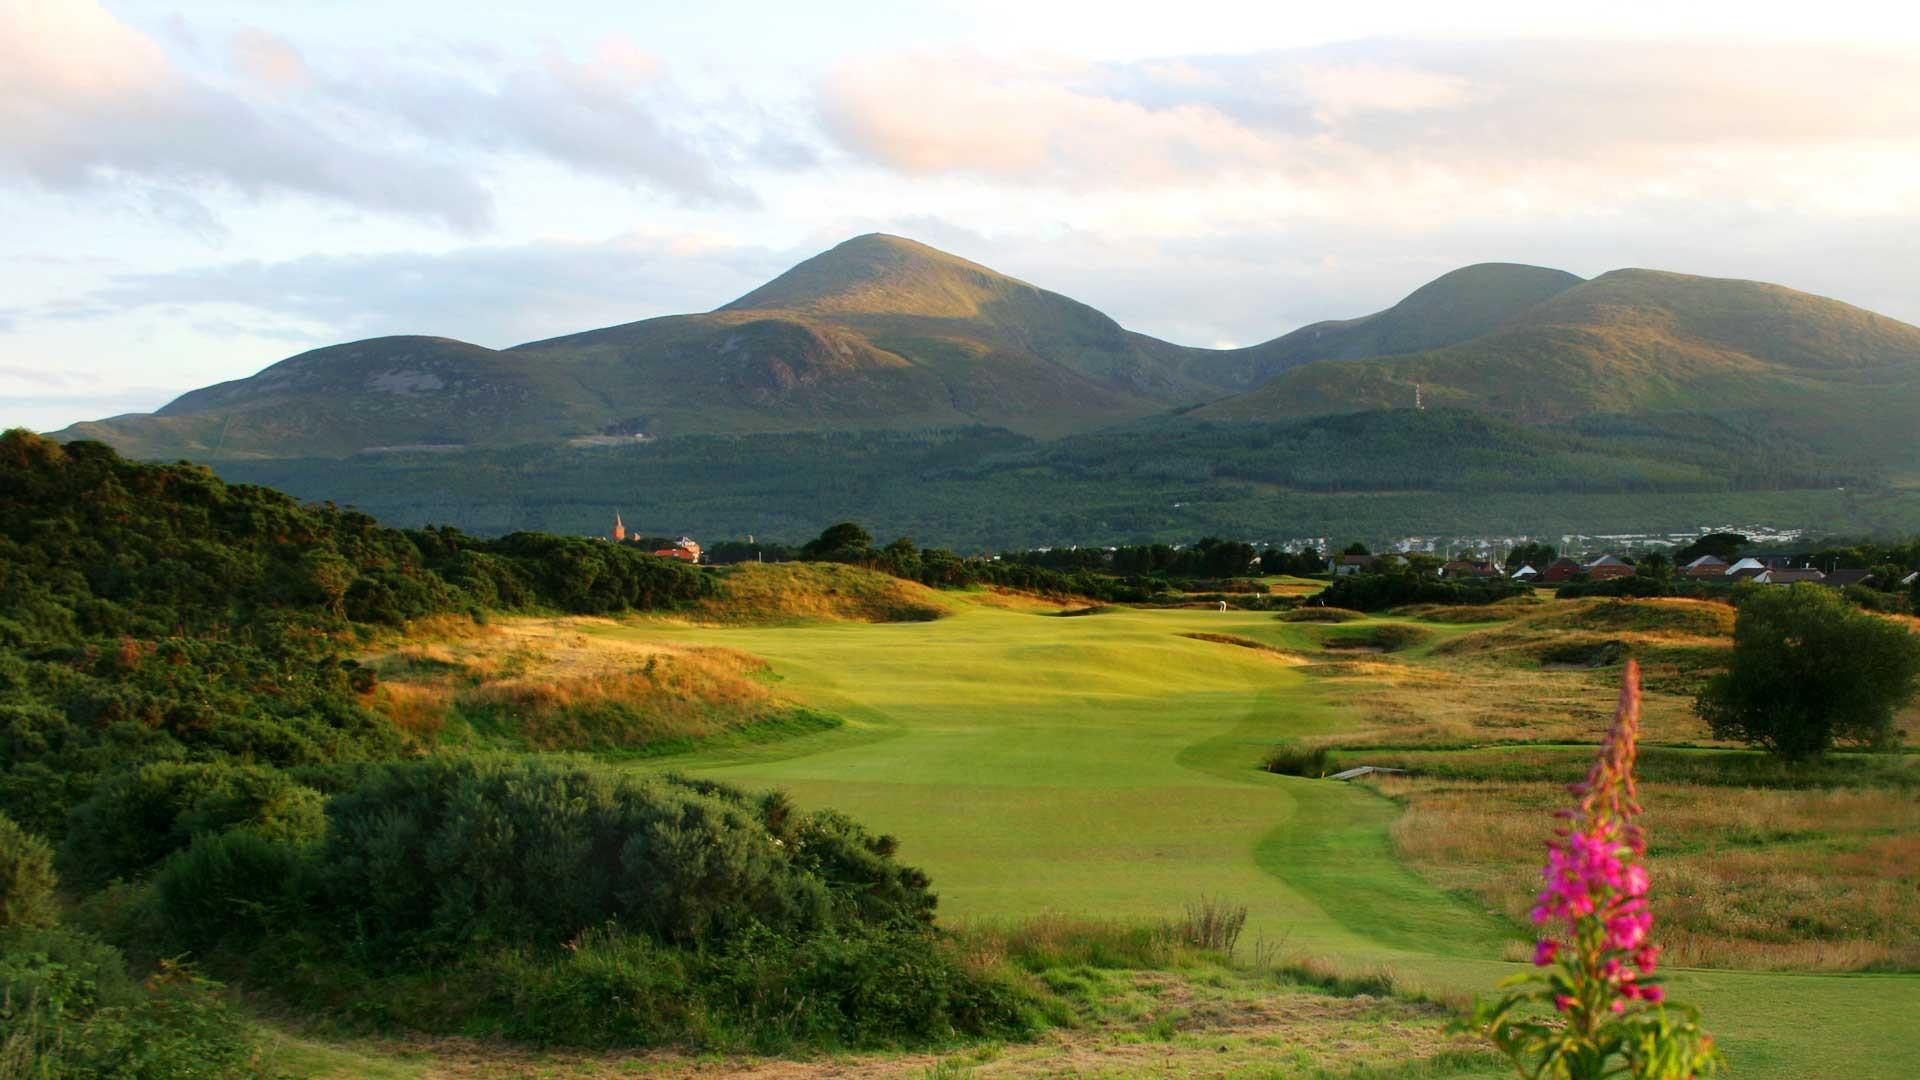 Royal County Down golf club, County Down, Northern Ireland